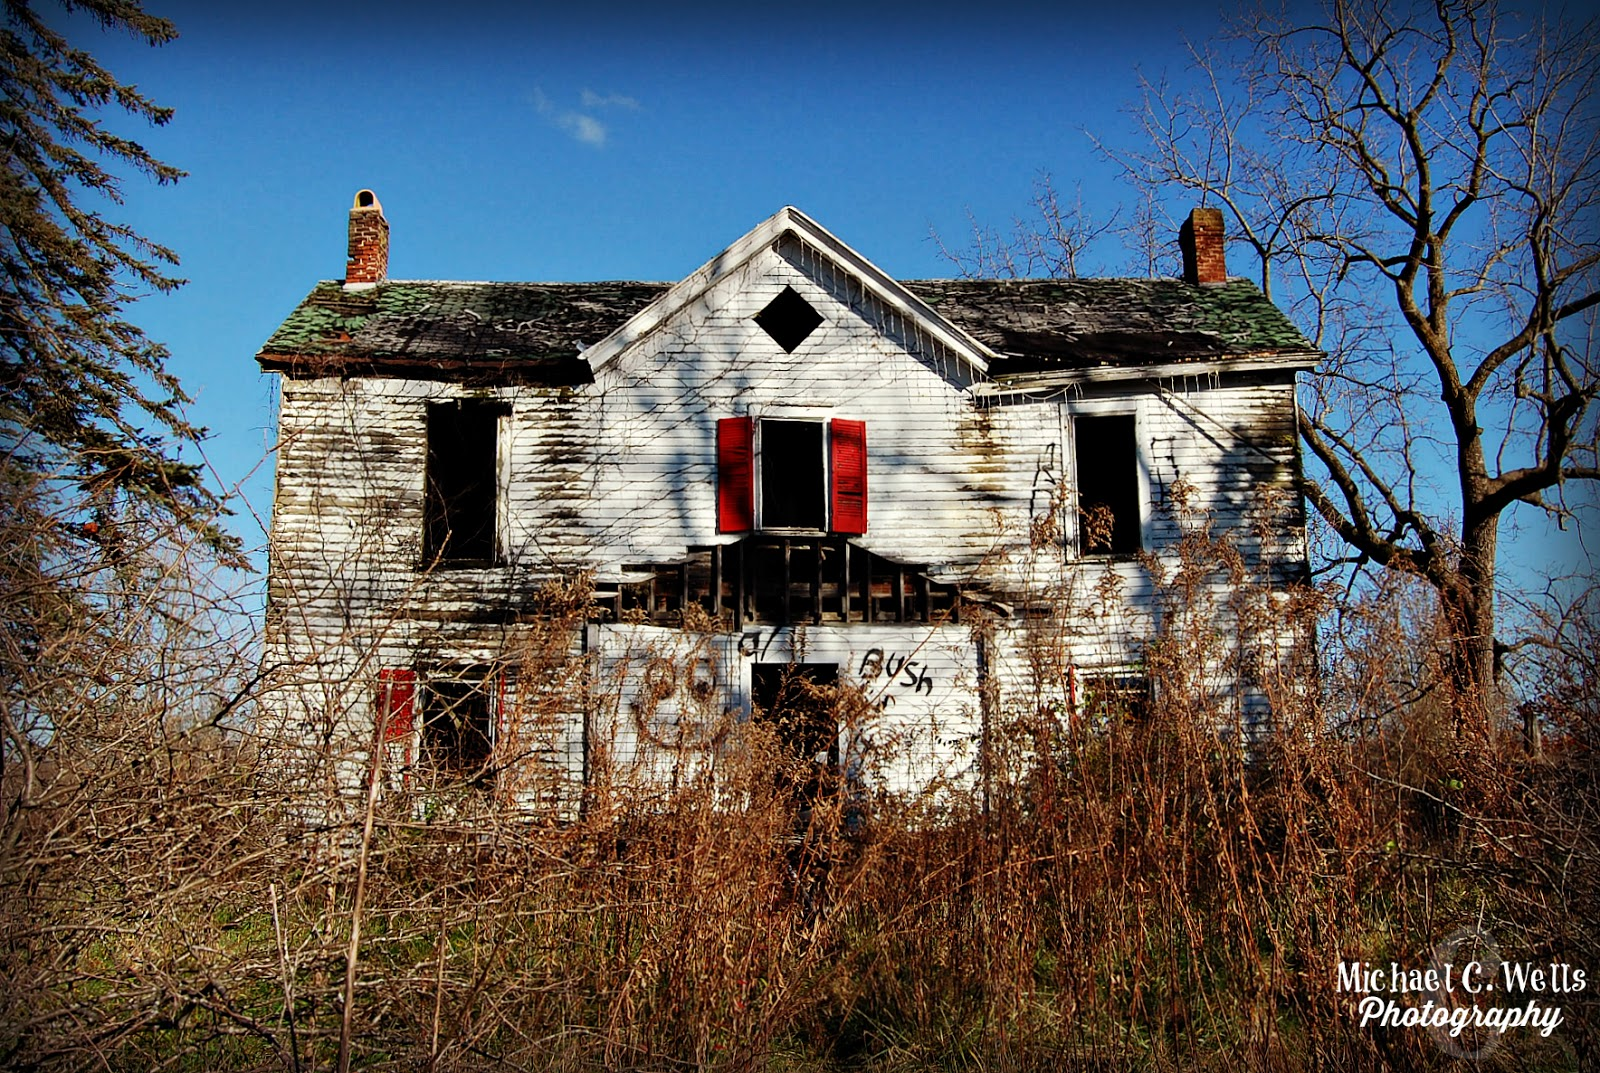 Michael C  Wells Photography: Abandoned Farmhouse II